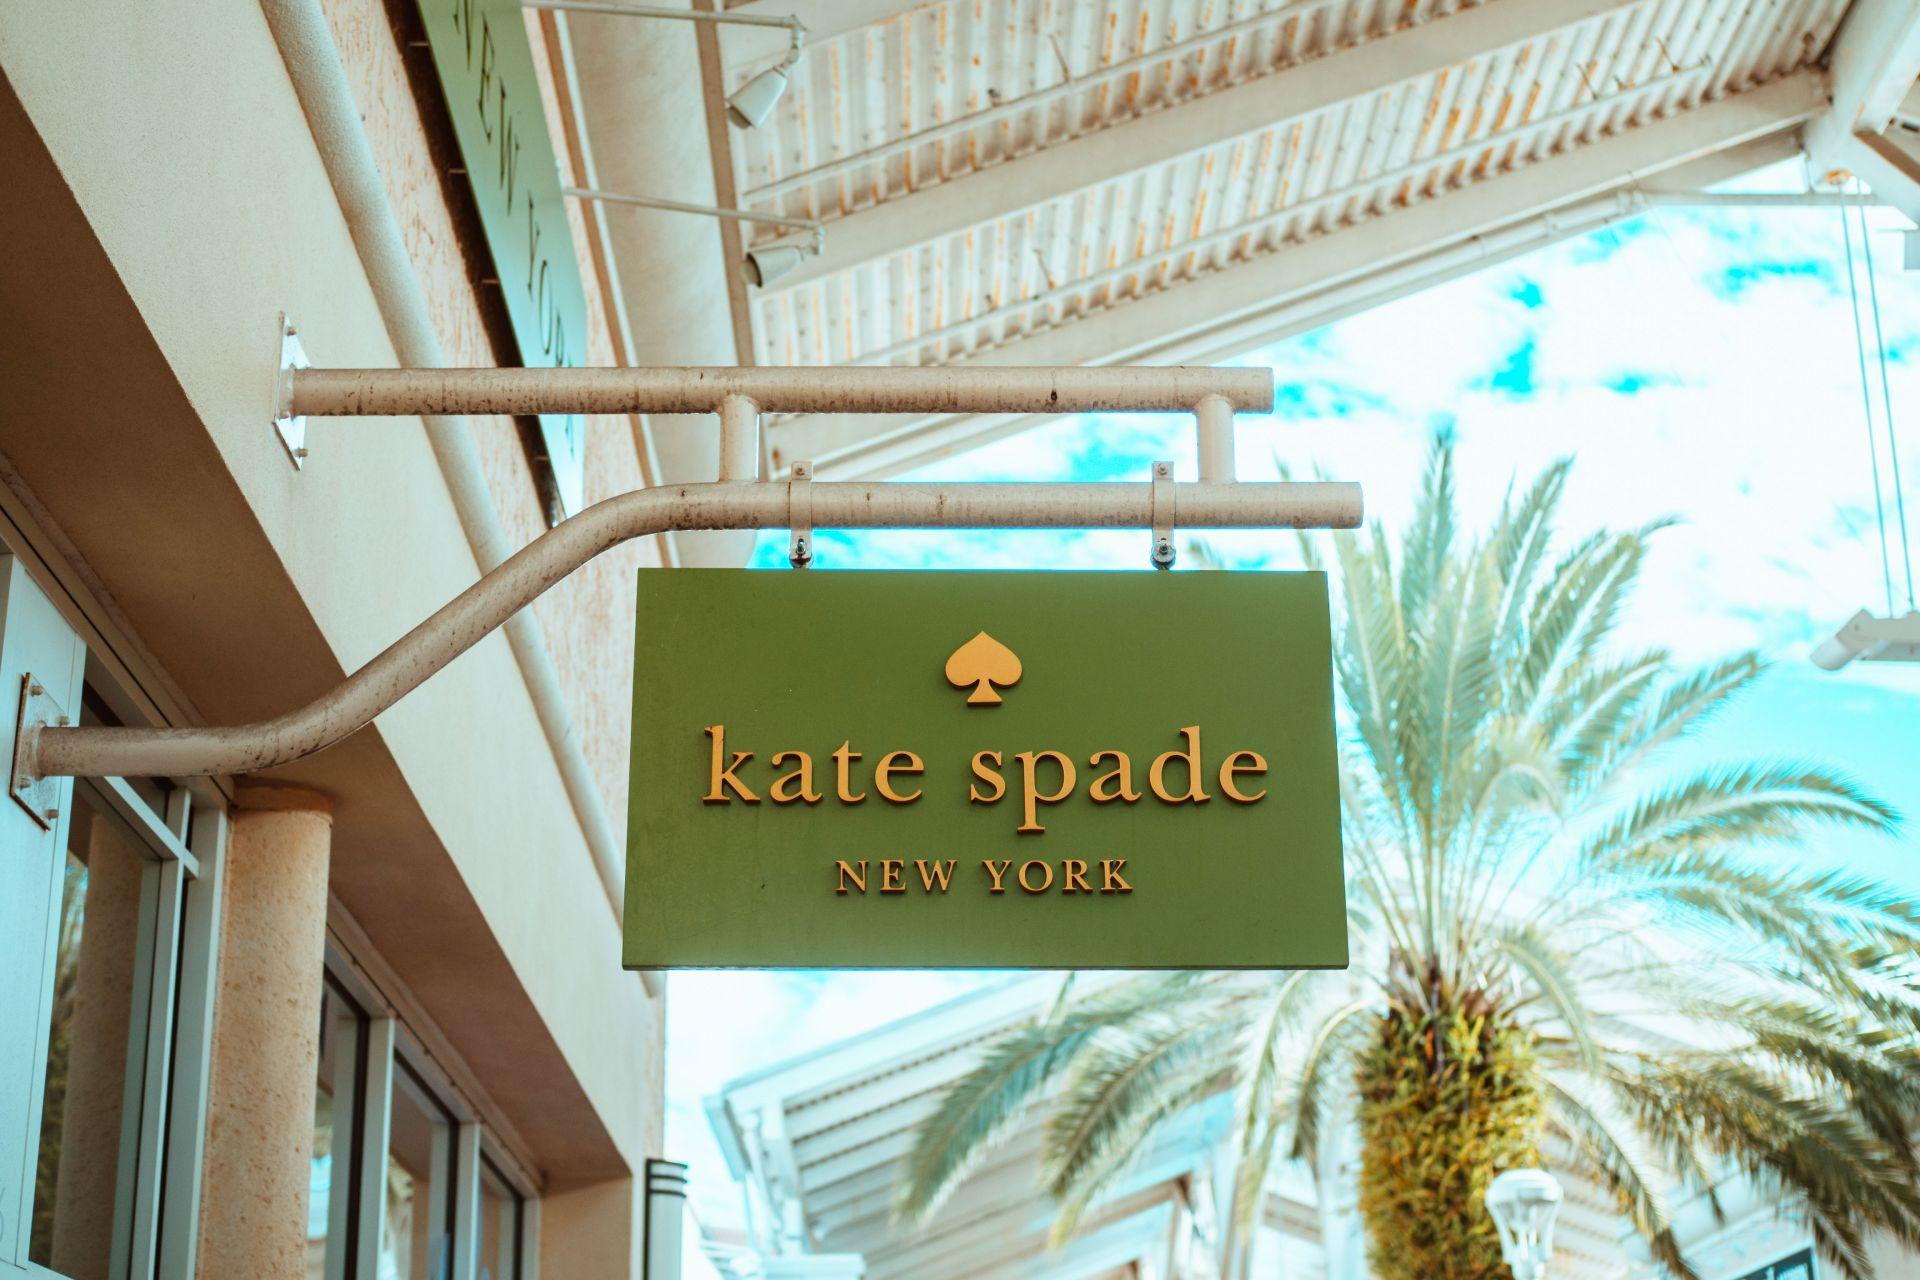 Kate Spade Outlet